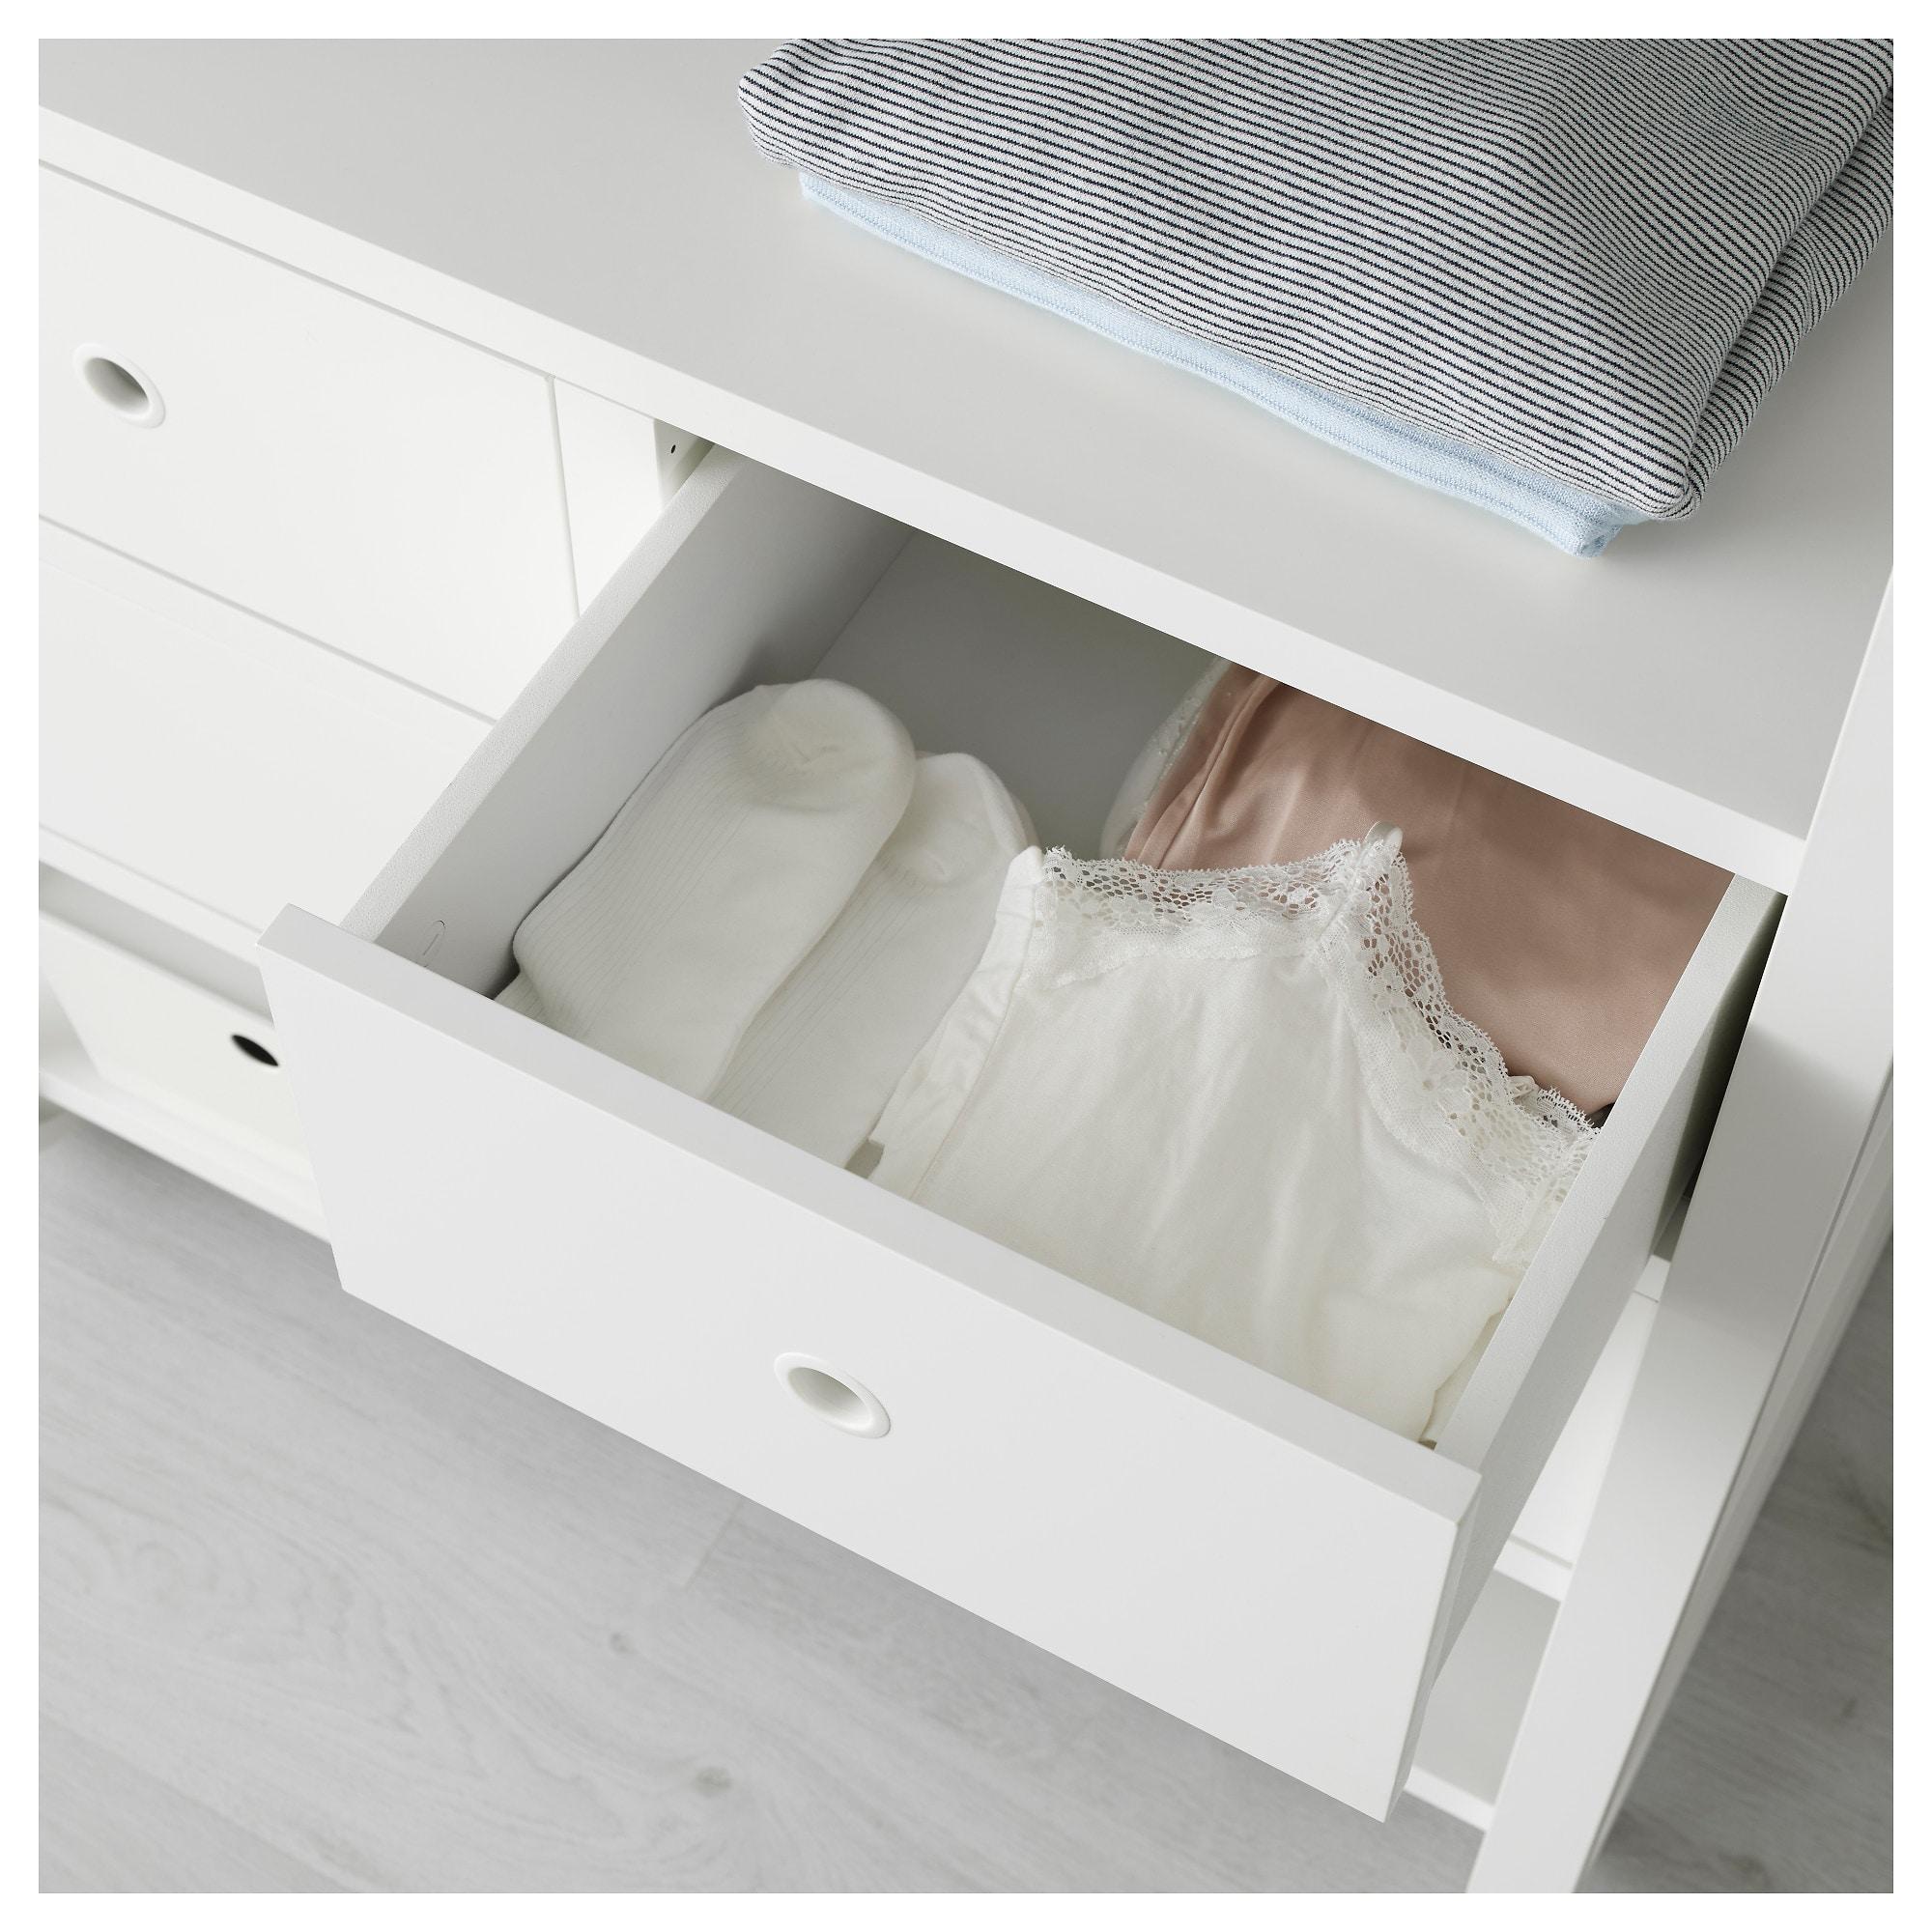 3 секции ЭЛВАРЛИ белый артикуль № 692.039.67 в наличии. Онлайн магазин IKEA Беларусь. Недорогая доставка и установка.